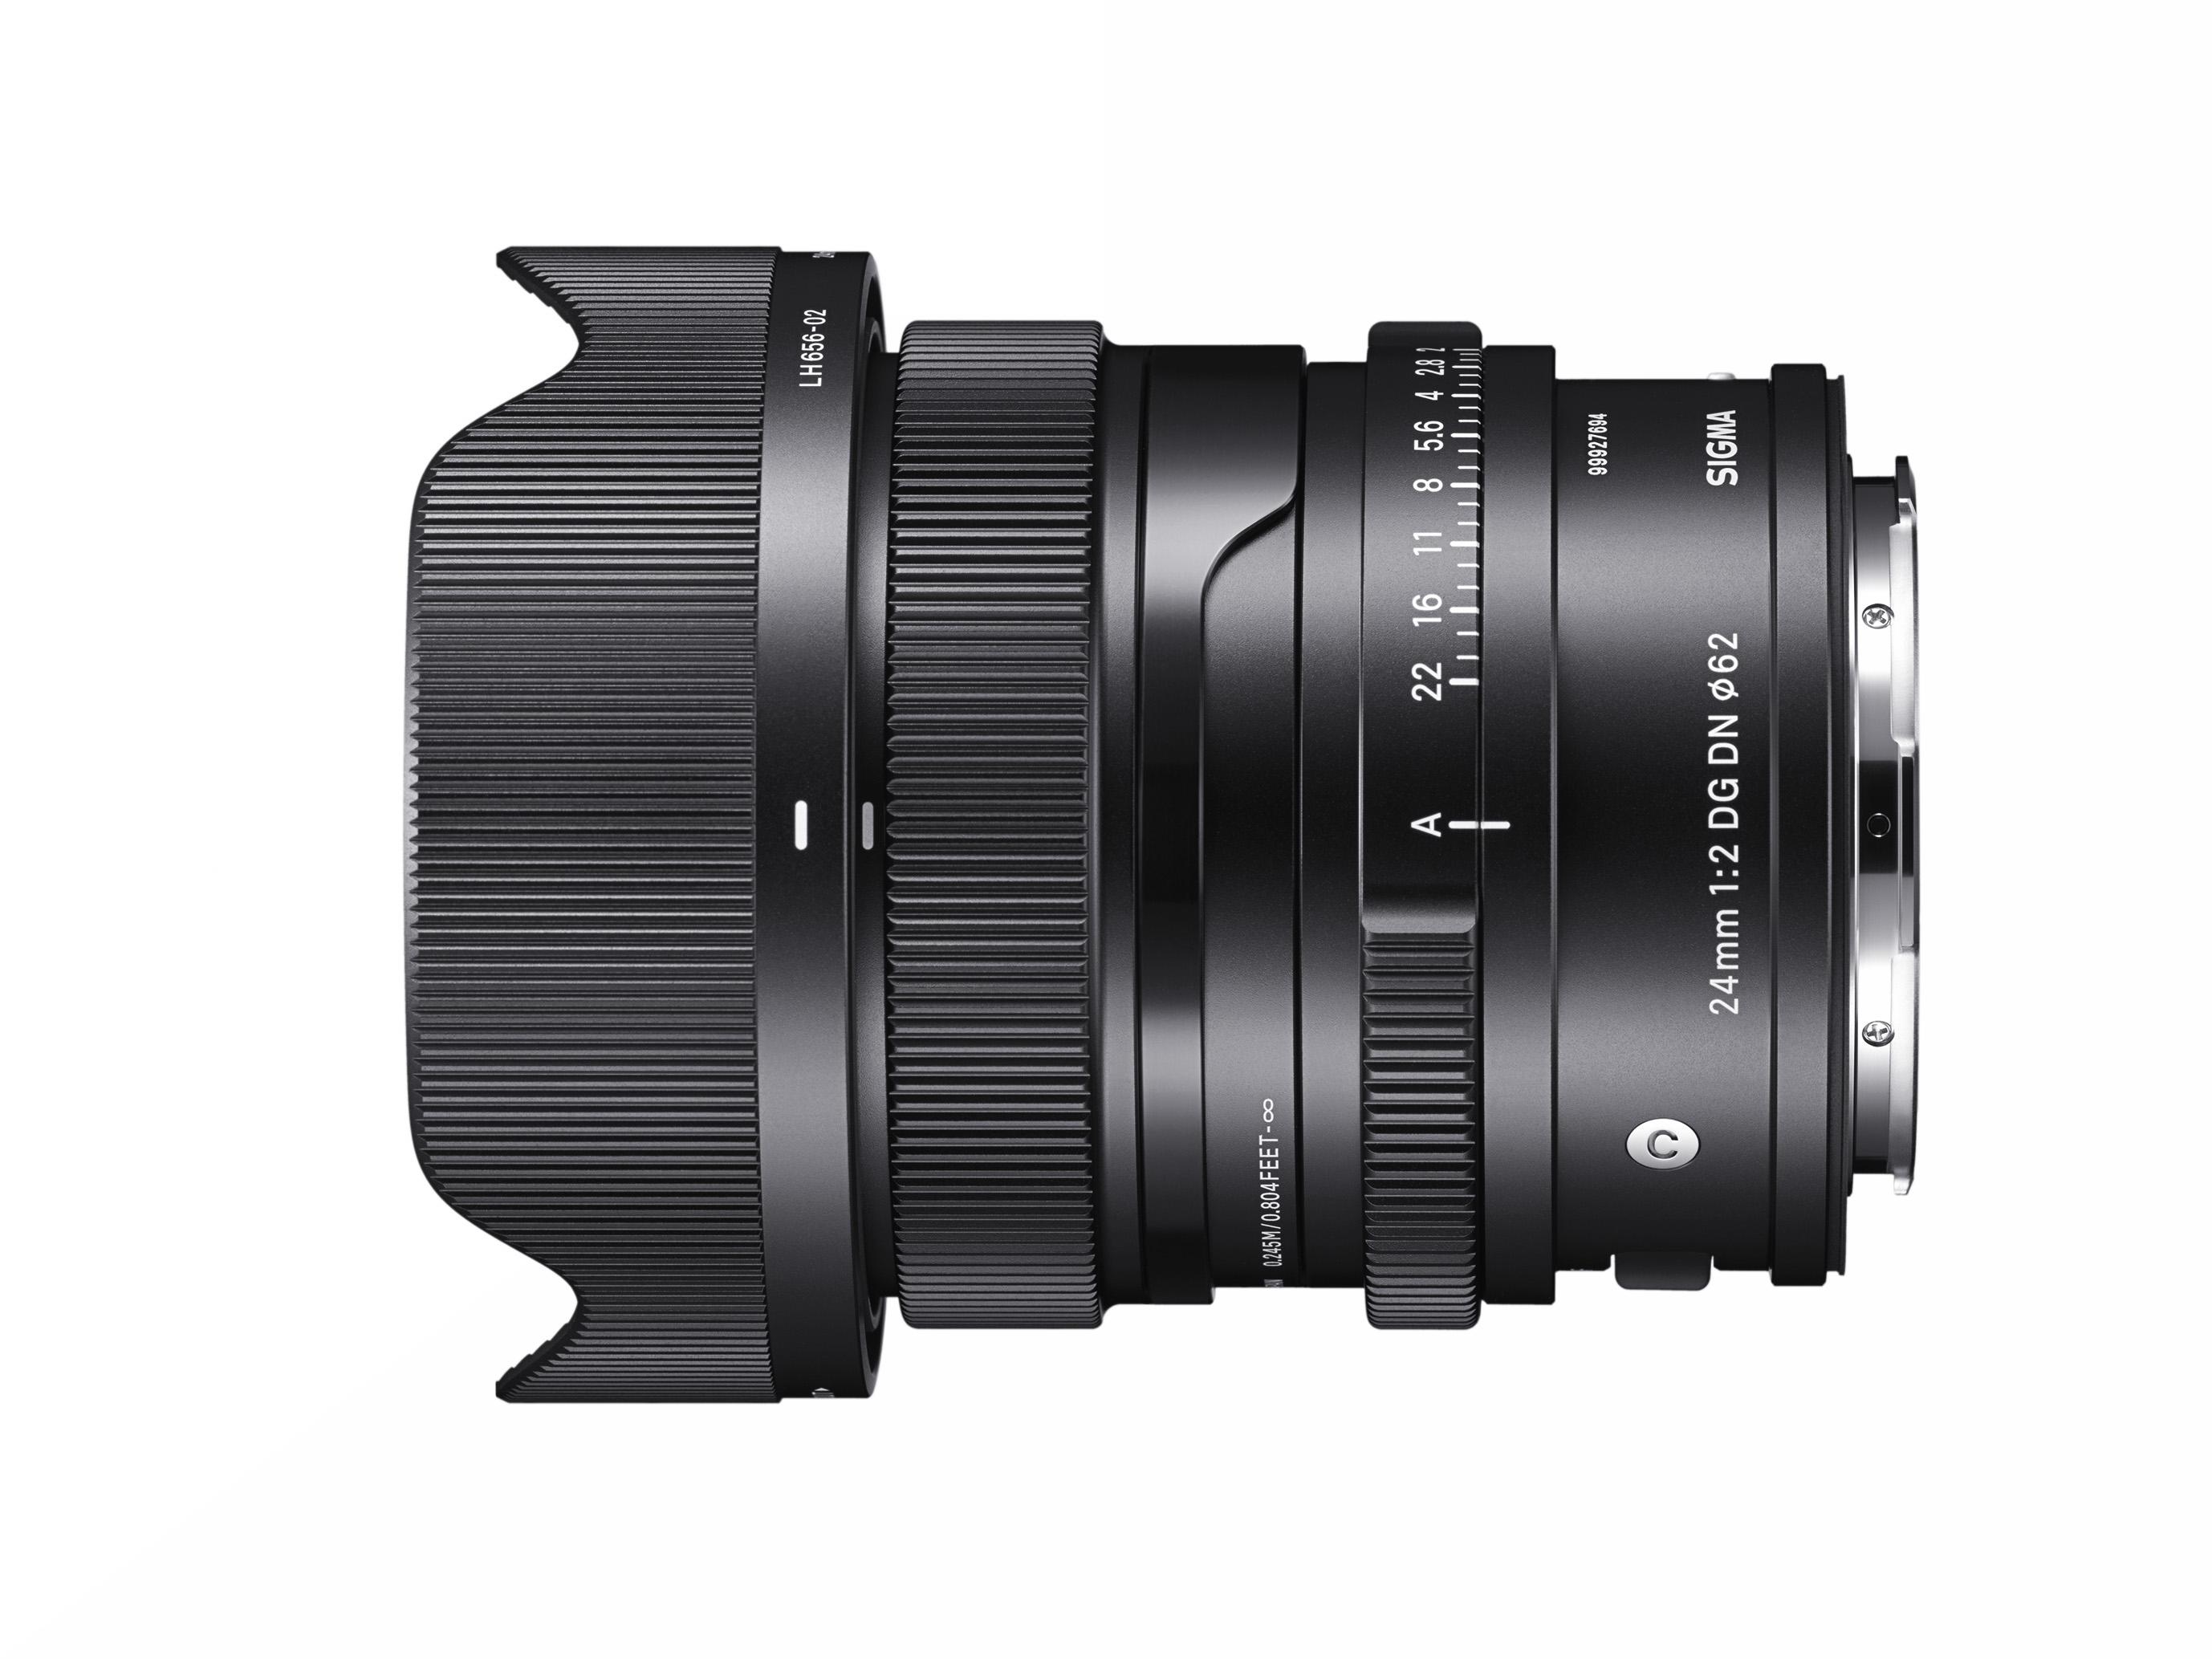 Supplied accessories: Magnetic metal lens cap (LCF62-01M), Petal-type lens hood (LH656-02), Front Cap (LCF-62III), Rear Cap (LCRII)